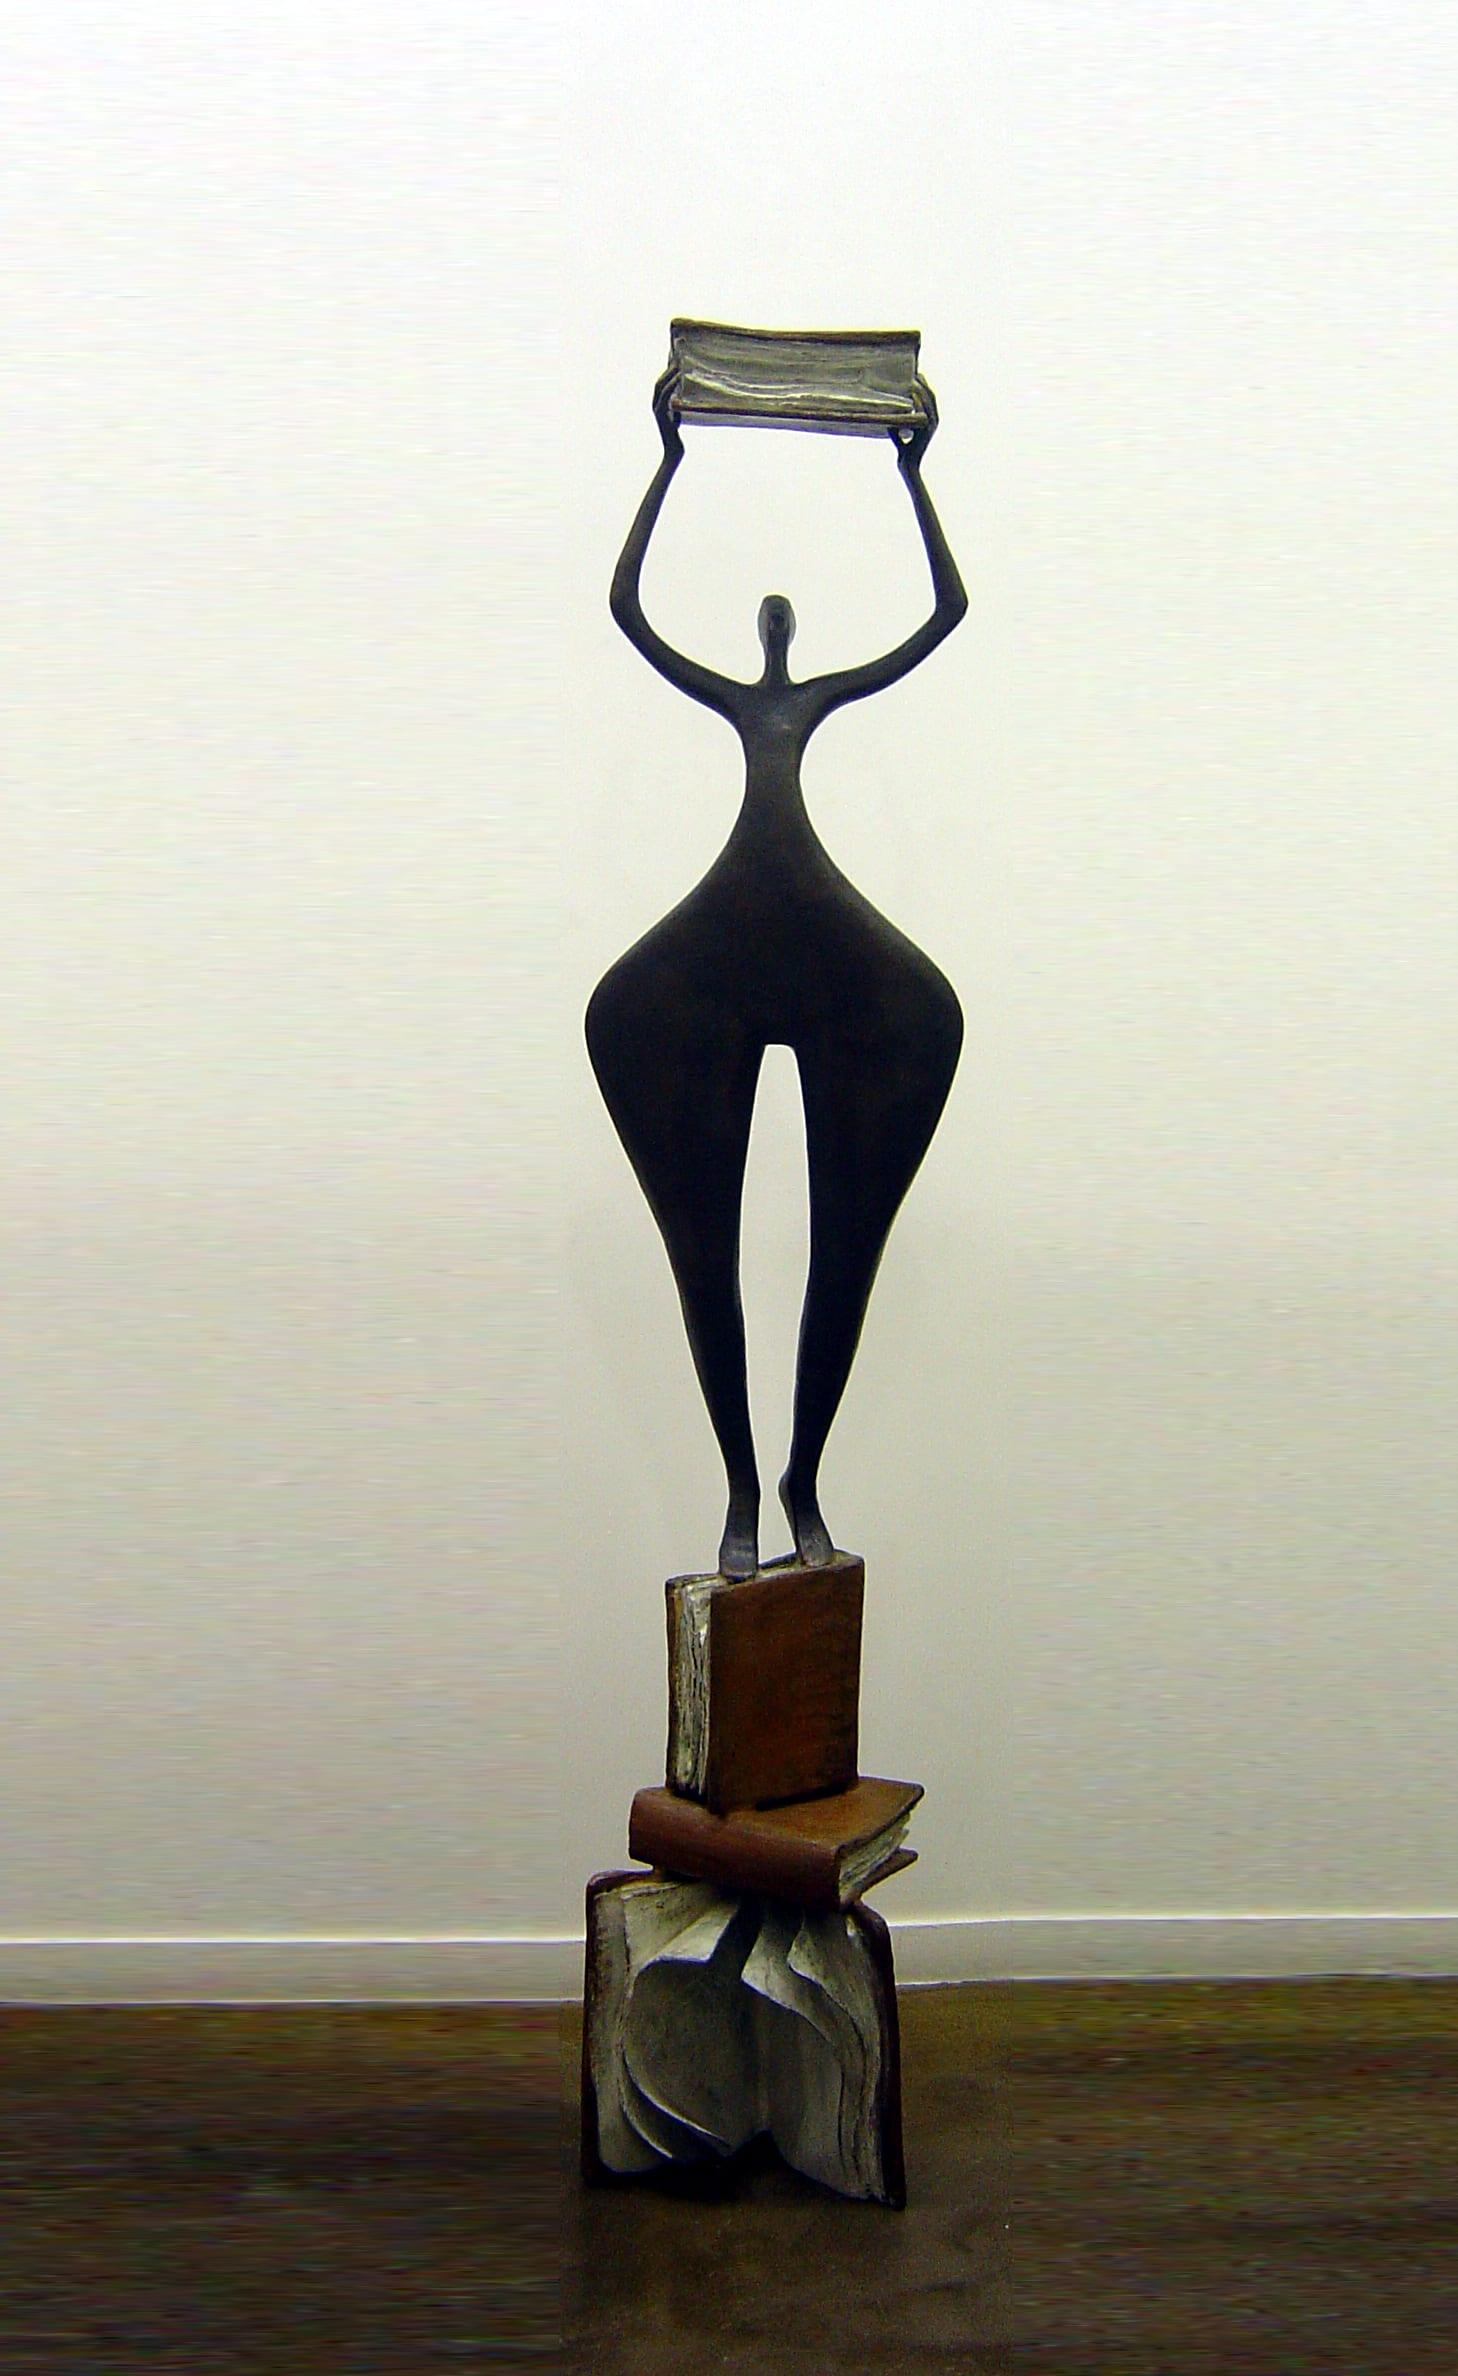 ACCUMULATING KNOWLEDGE Bronze 175cmx45x40cm / 69x17,7x15,7 inches